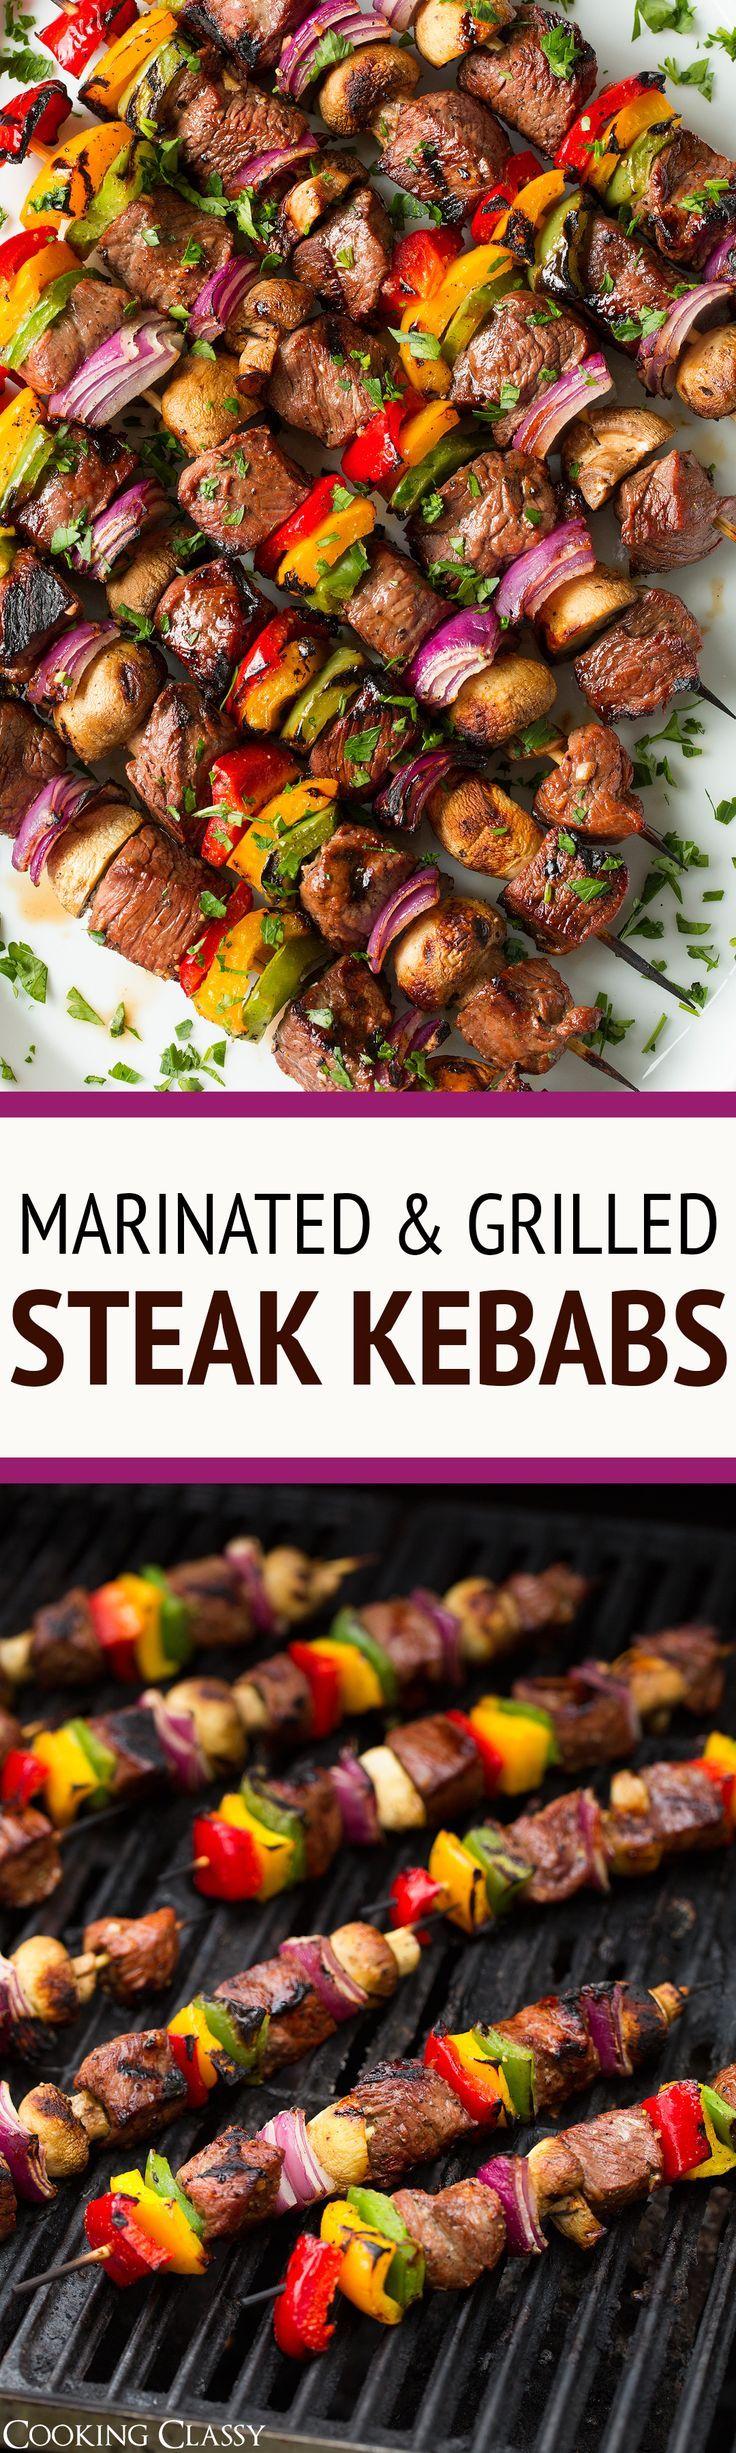 Steak Kebabs | Grilled Foods | Barbecue Party Food Ideas